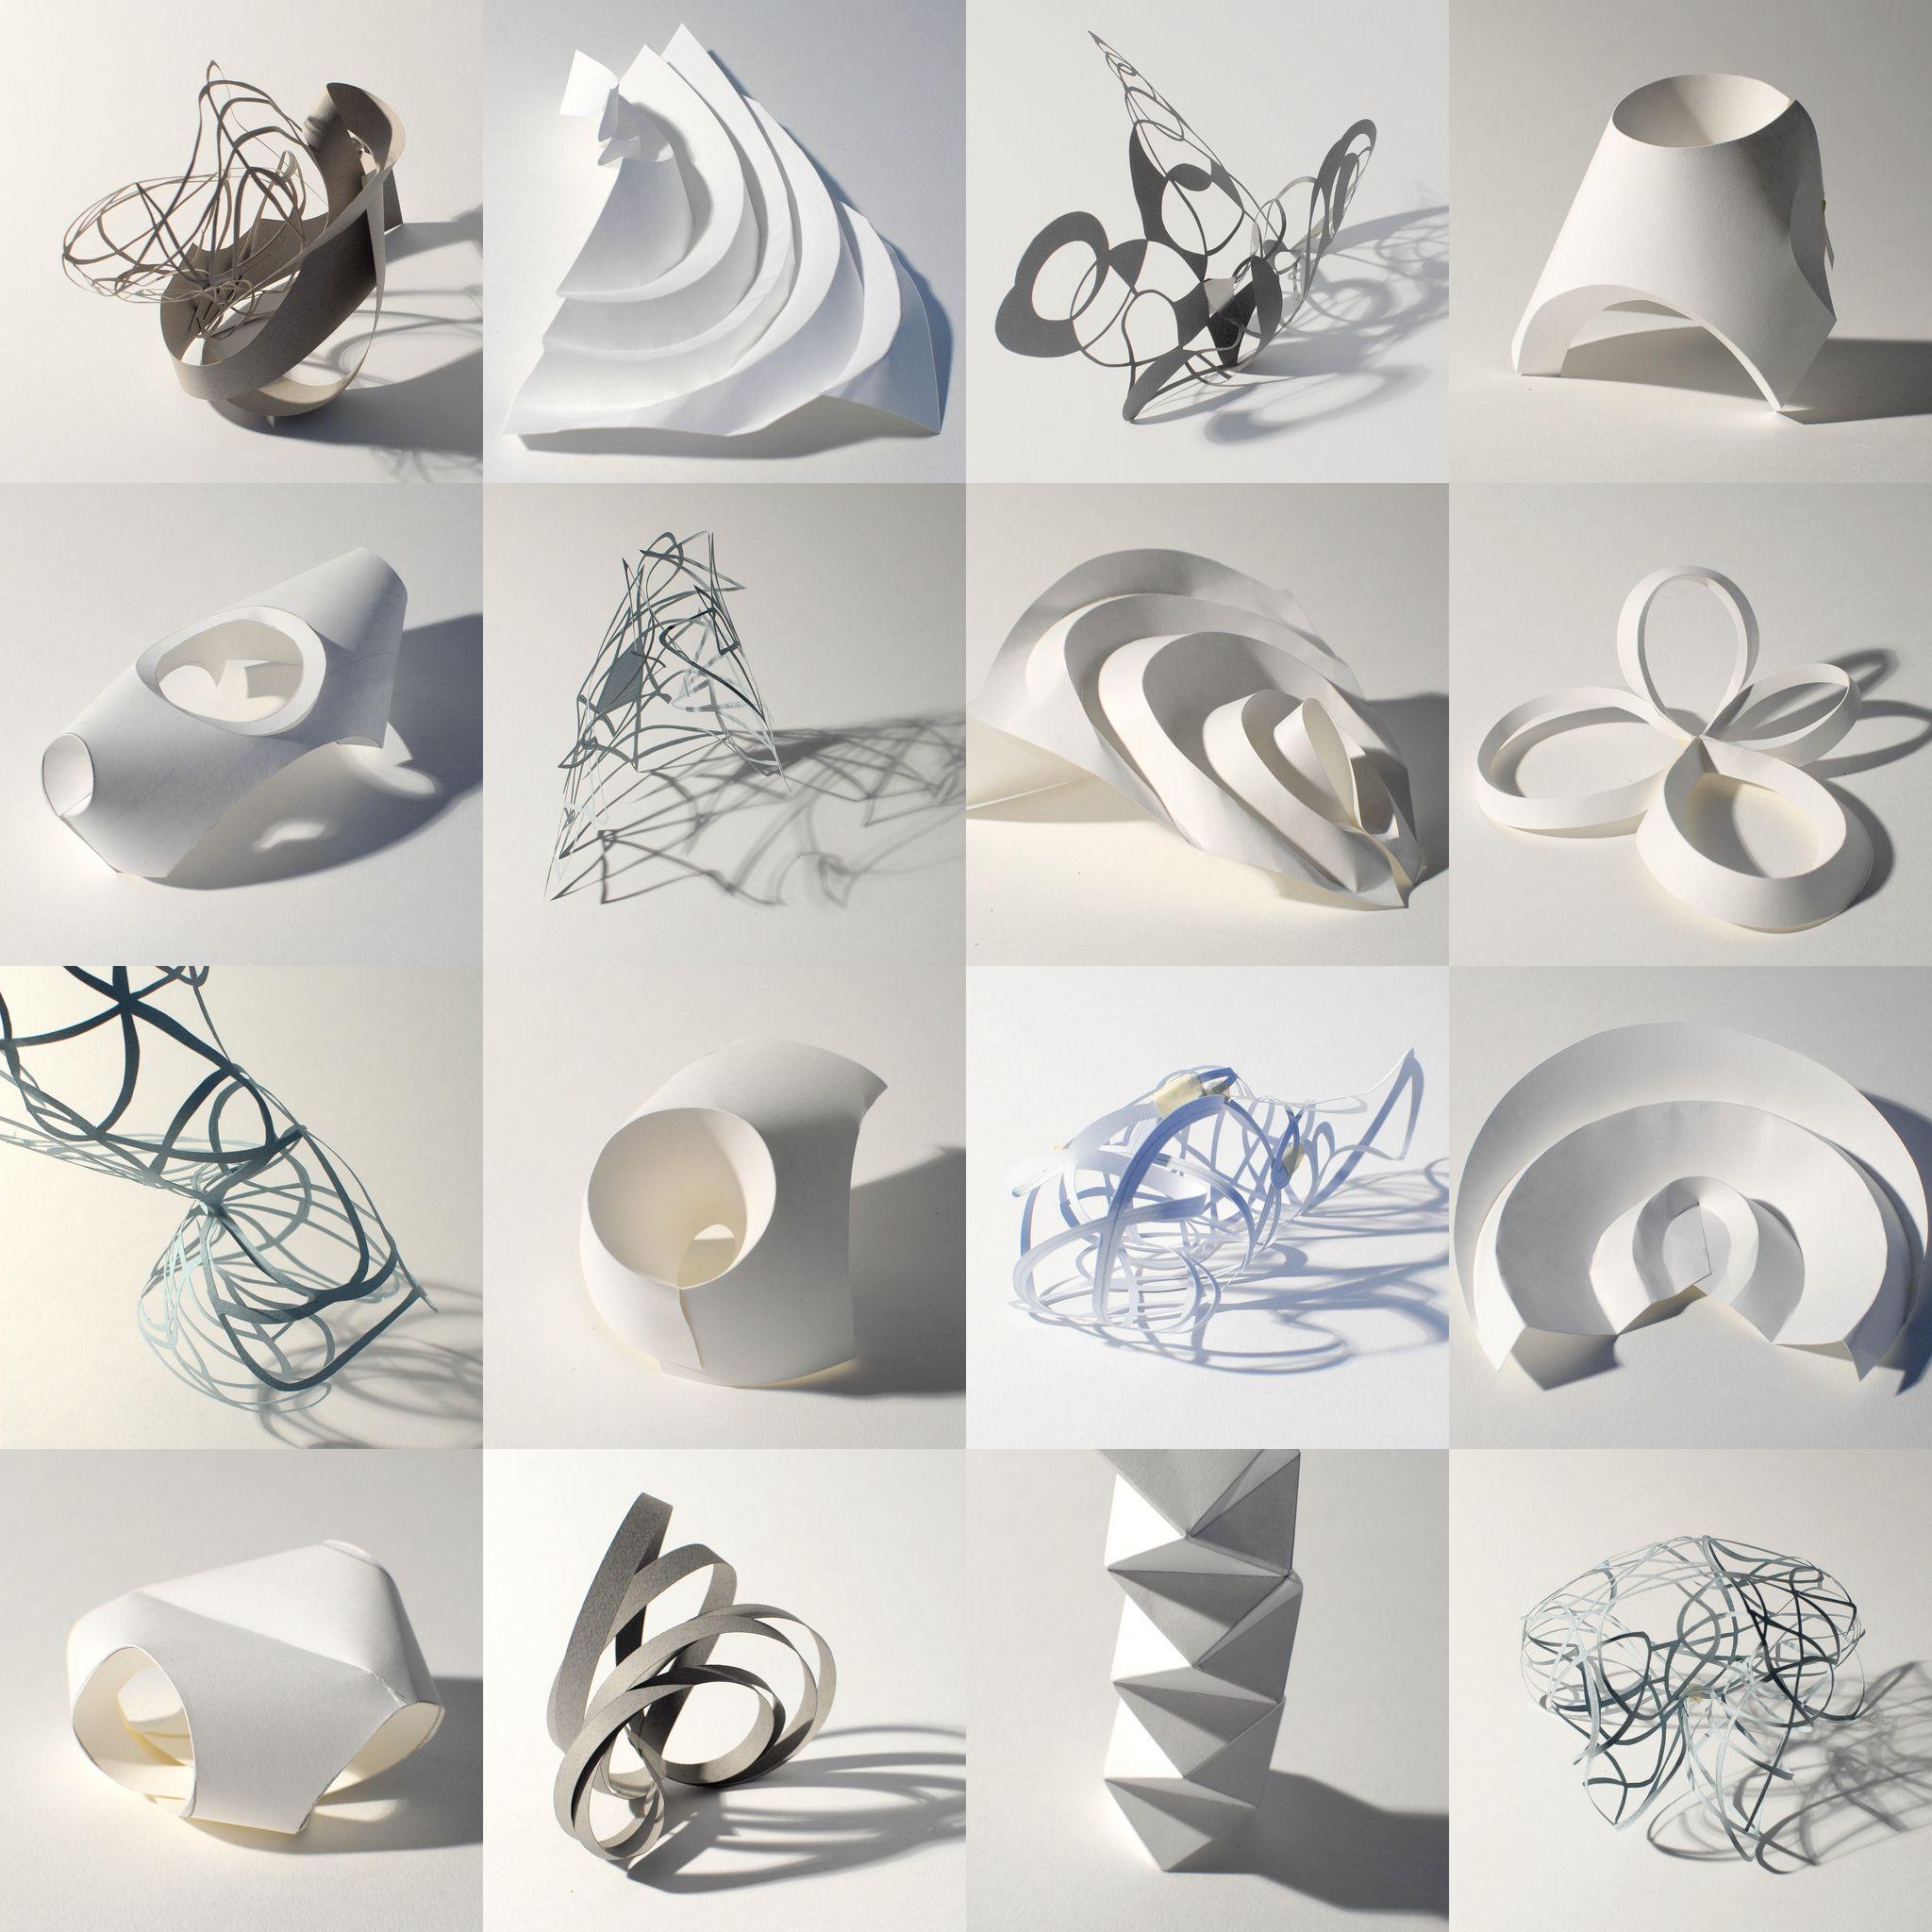 Paper Sculpture Workshop